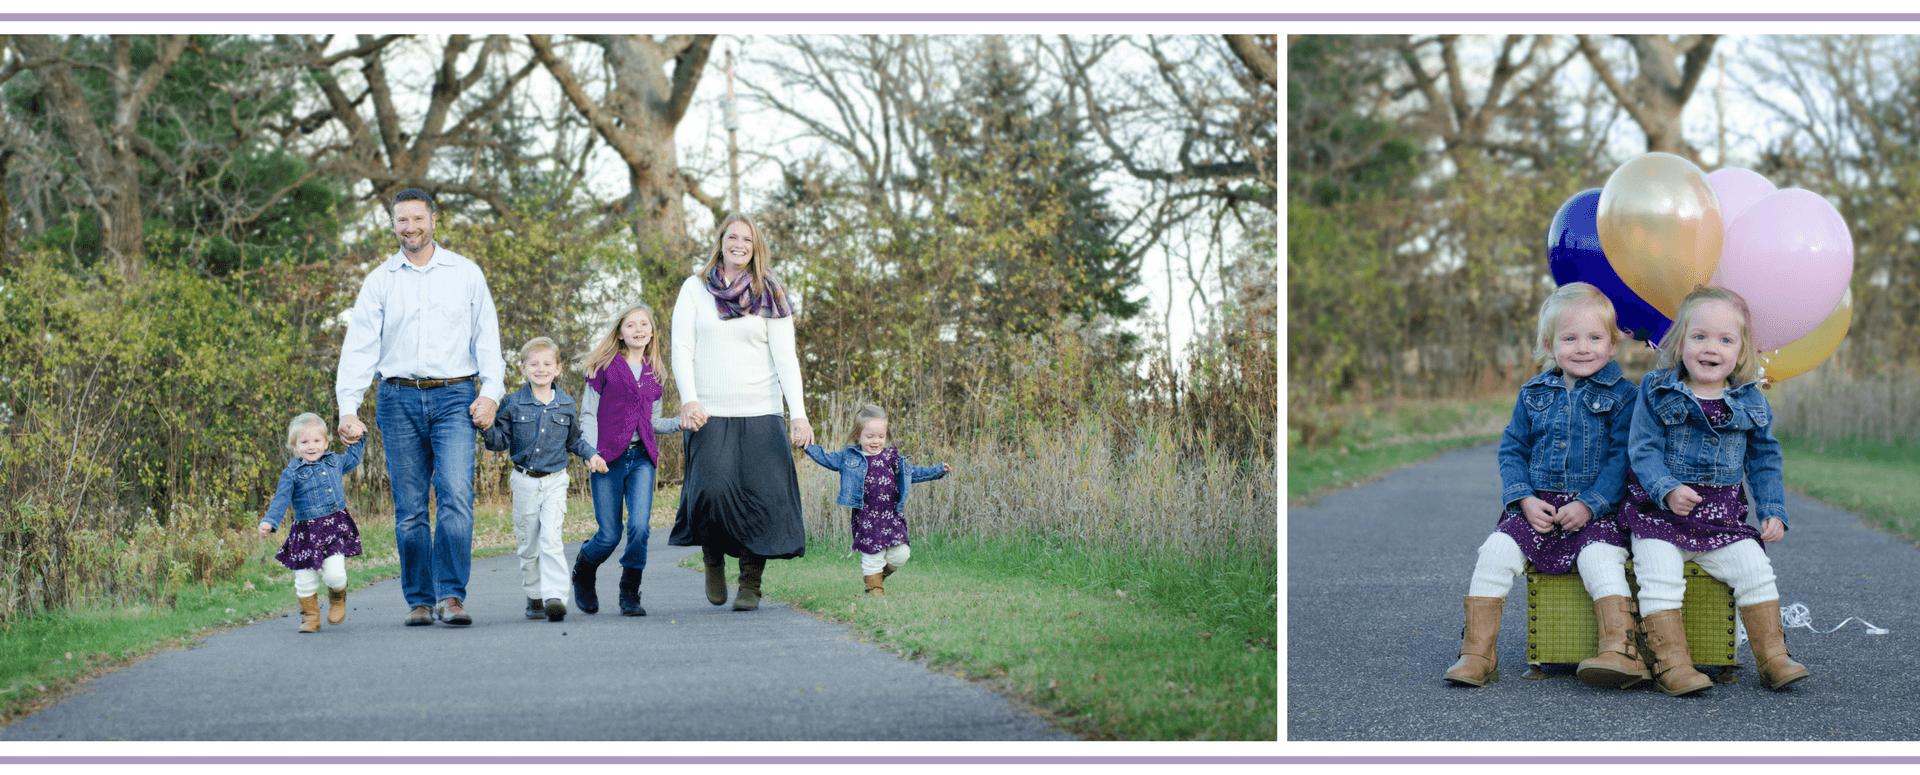 Woodbury MN Photographer   Family Photographer   Focus Photography of Minnesota